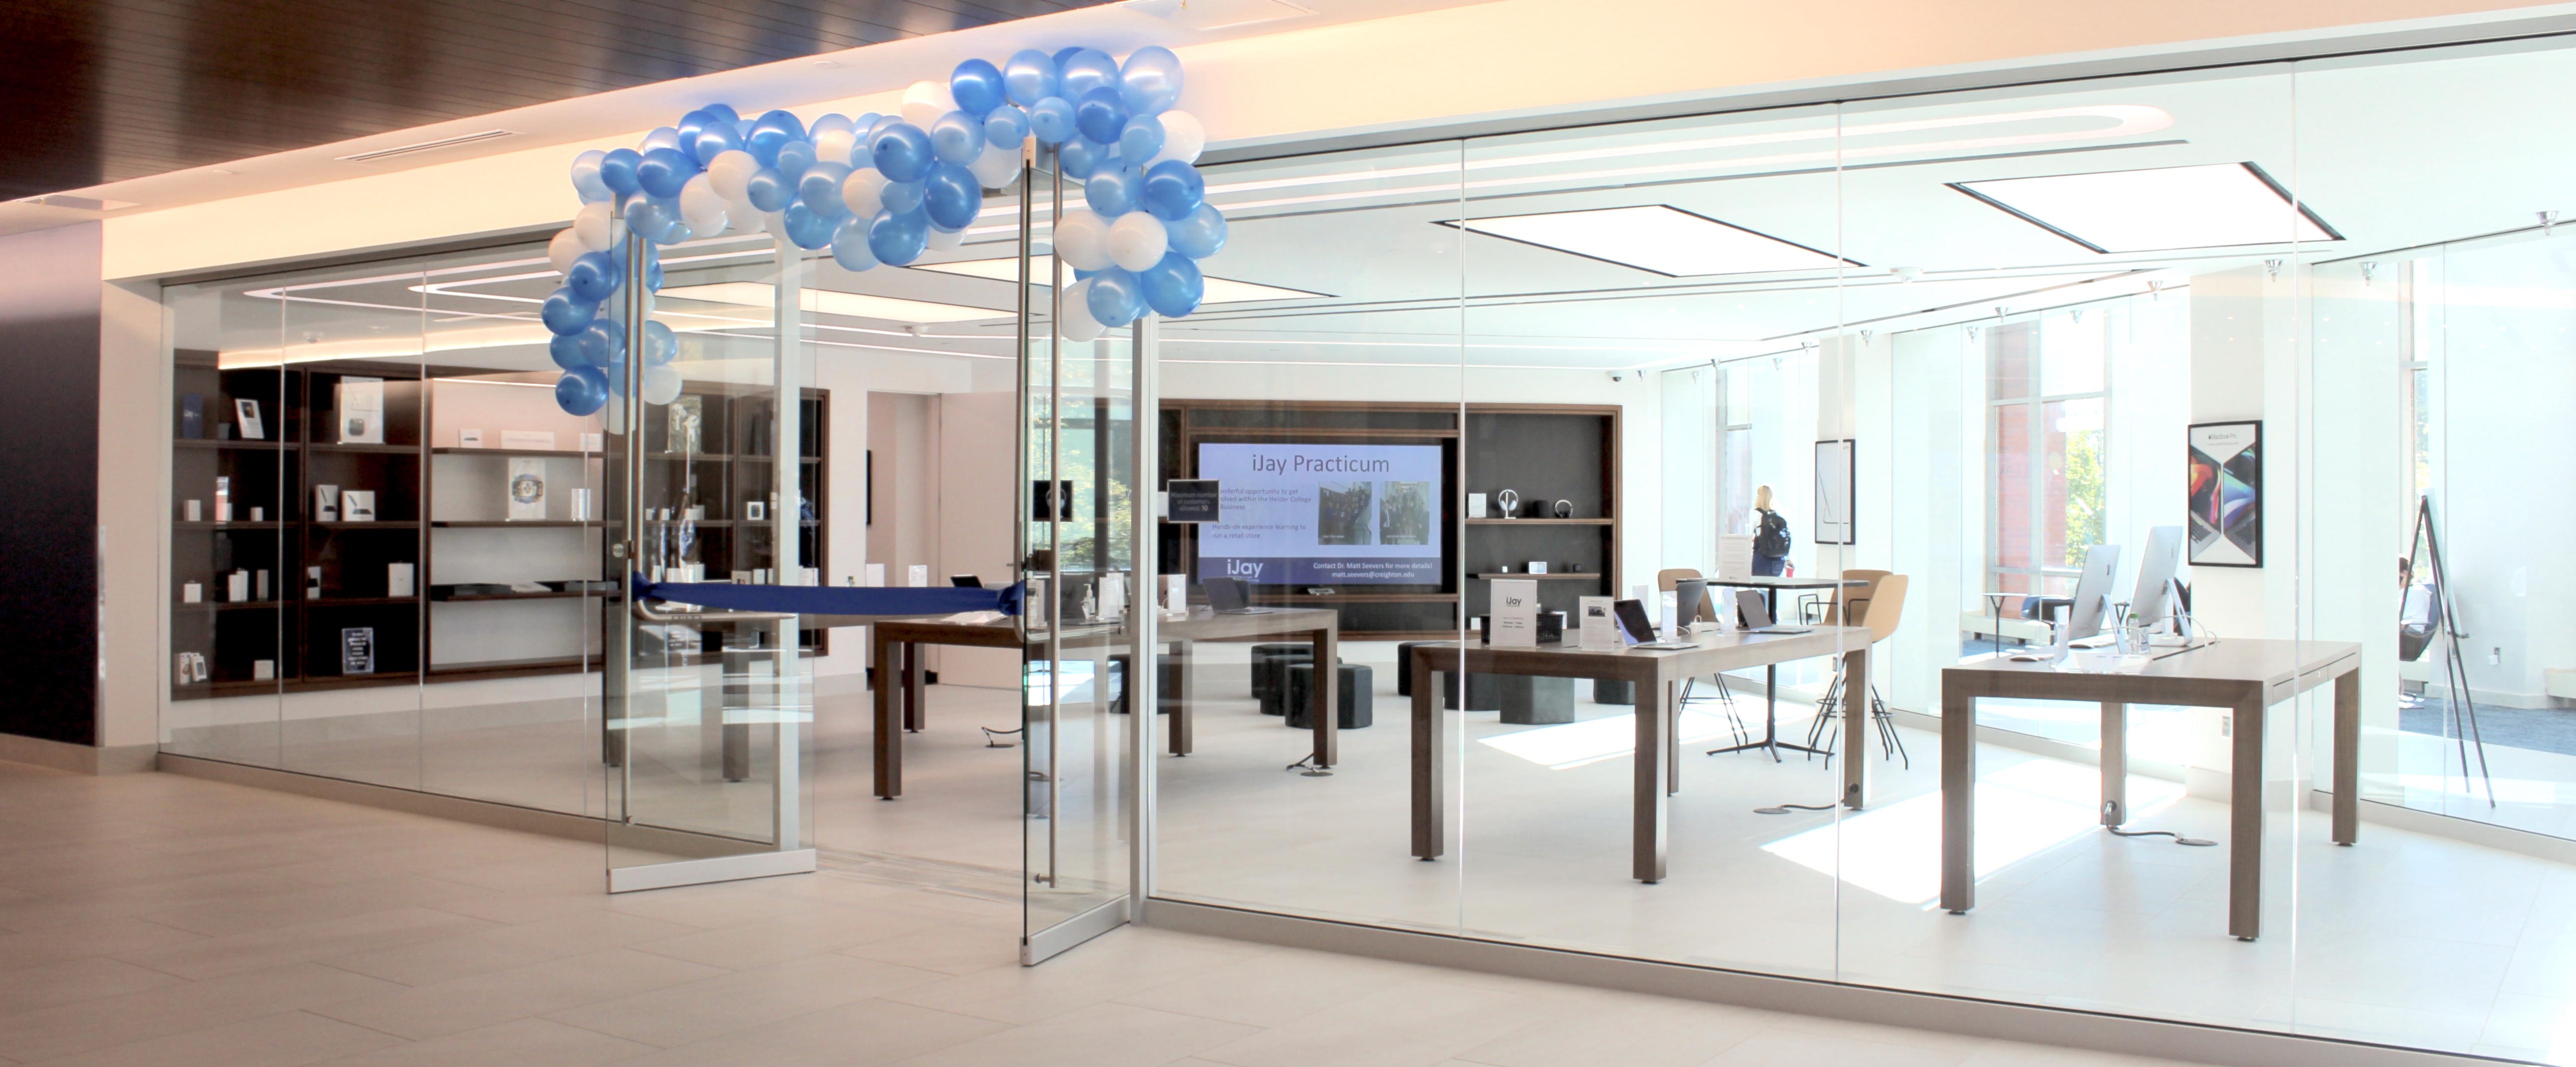 iJay Apple Store Creighton University